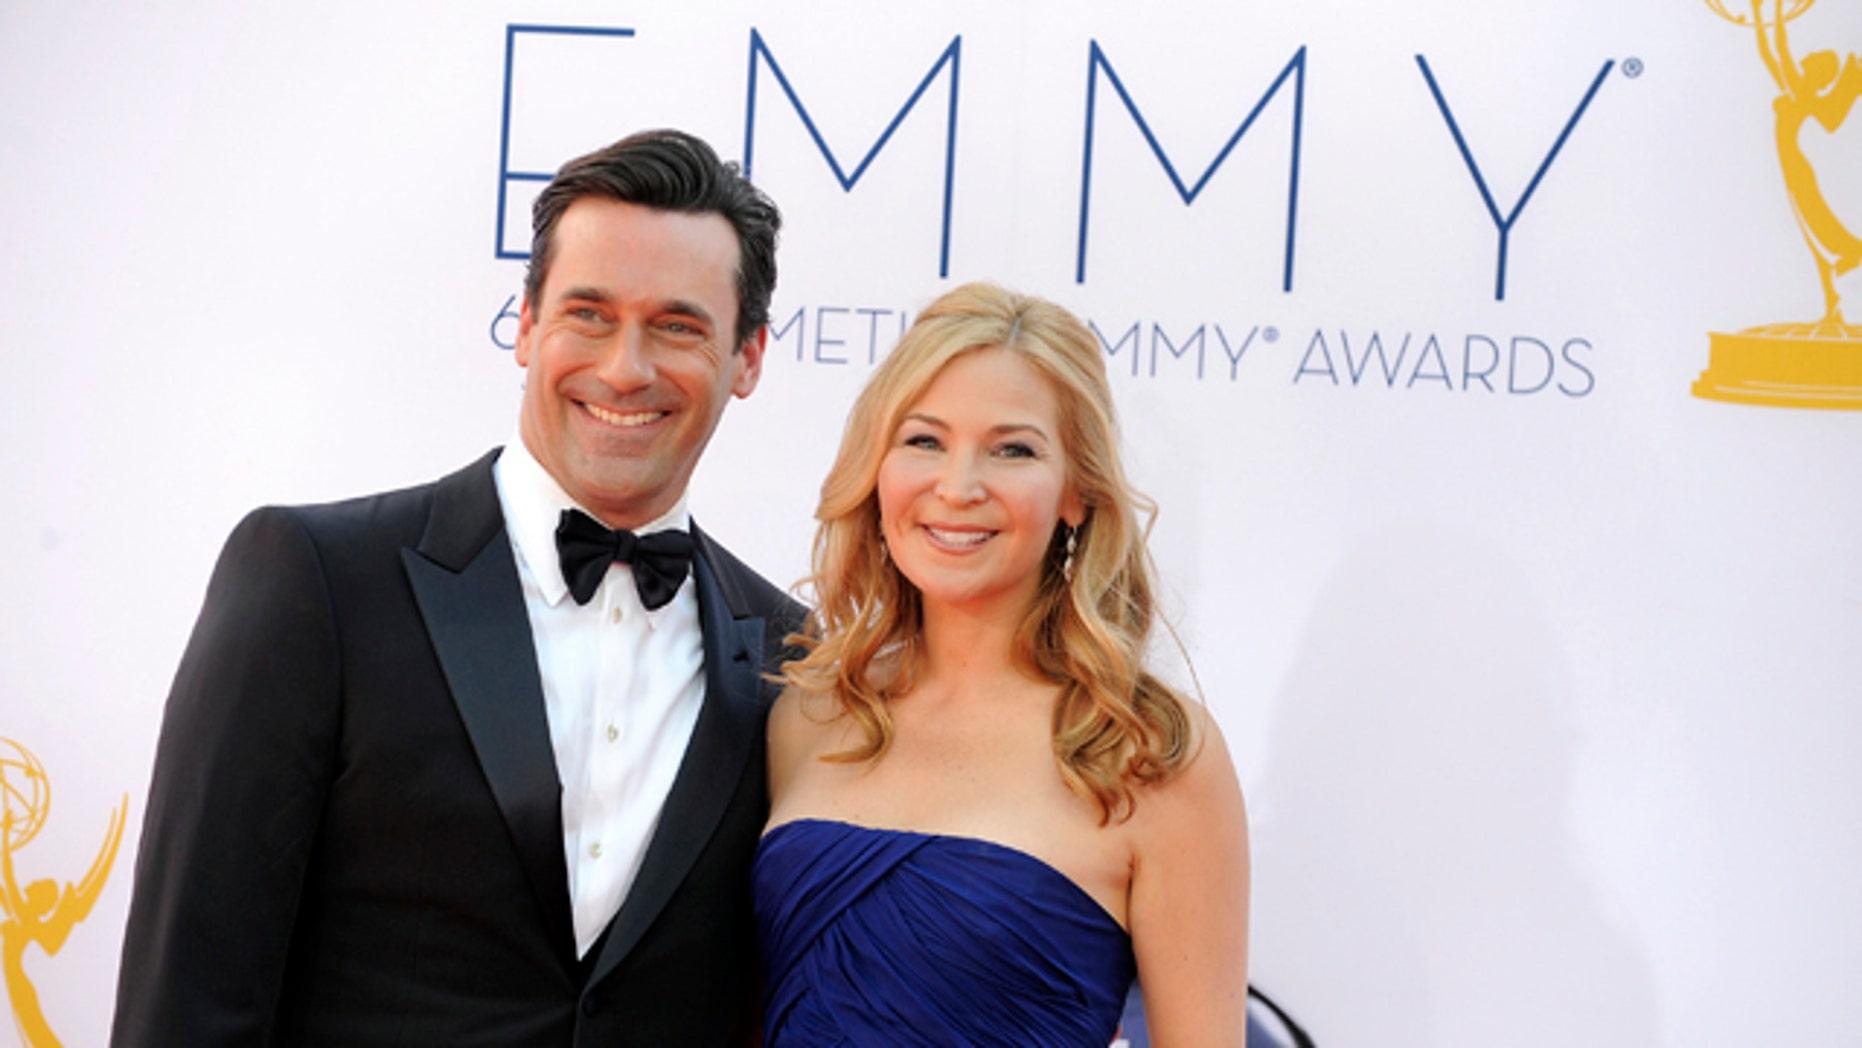 Sept. 23, 2012: Jon Hamm, left and Jennifer Westfeldt arrive at the 64th Primetime Emmy Awards at the Nokia Theatre in Los Angeles.